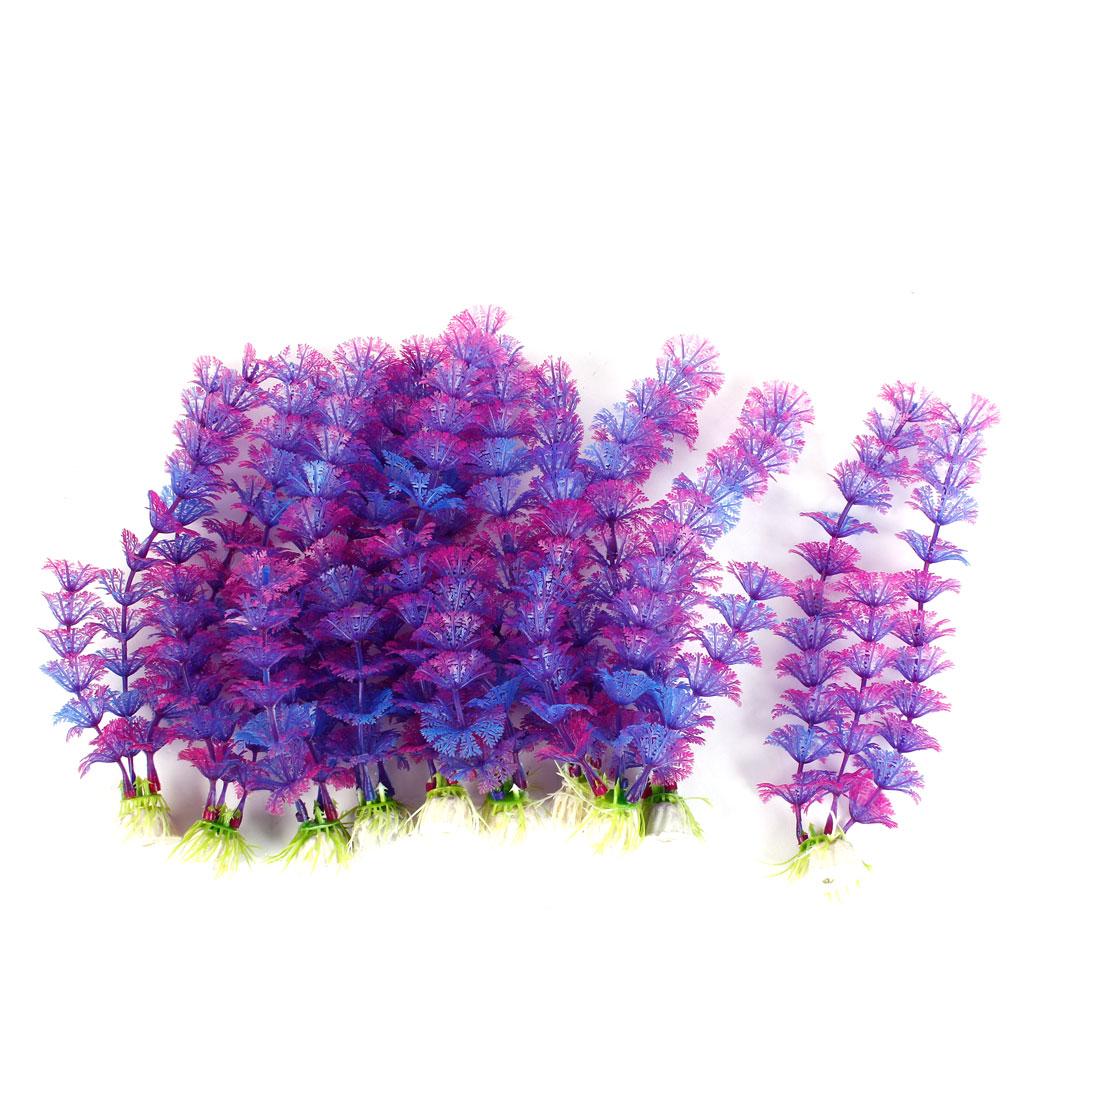 "Aquarium Tank Plastic Grass Plant Decor Purple 8.8"" Height 10Pcs"